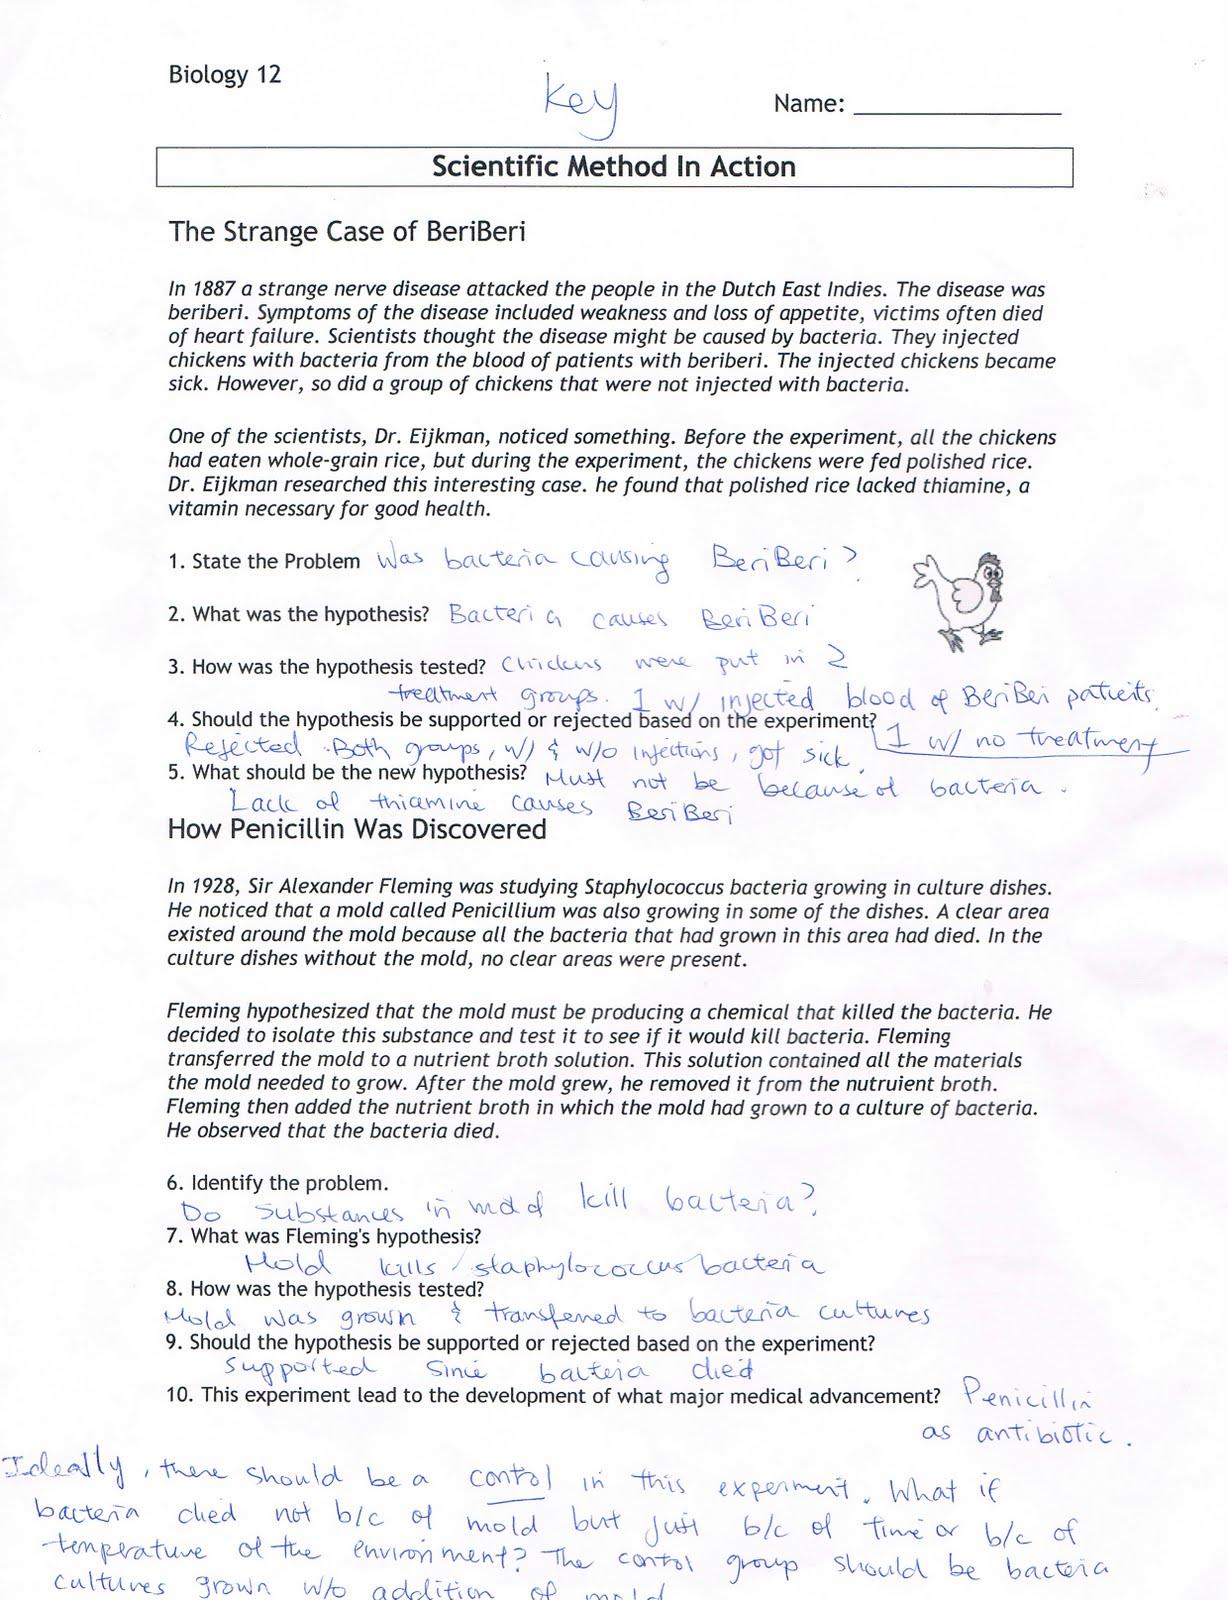 Identifying Variables Worksheet 023 - Identifying Variables Worksheet